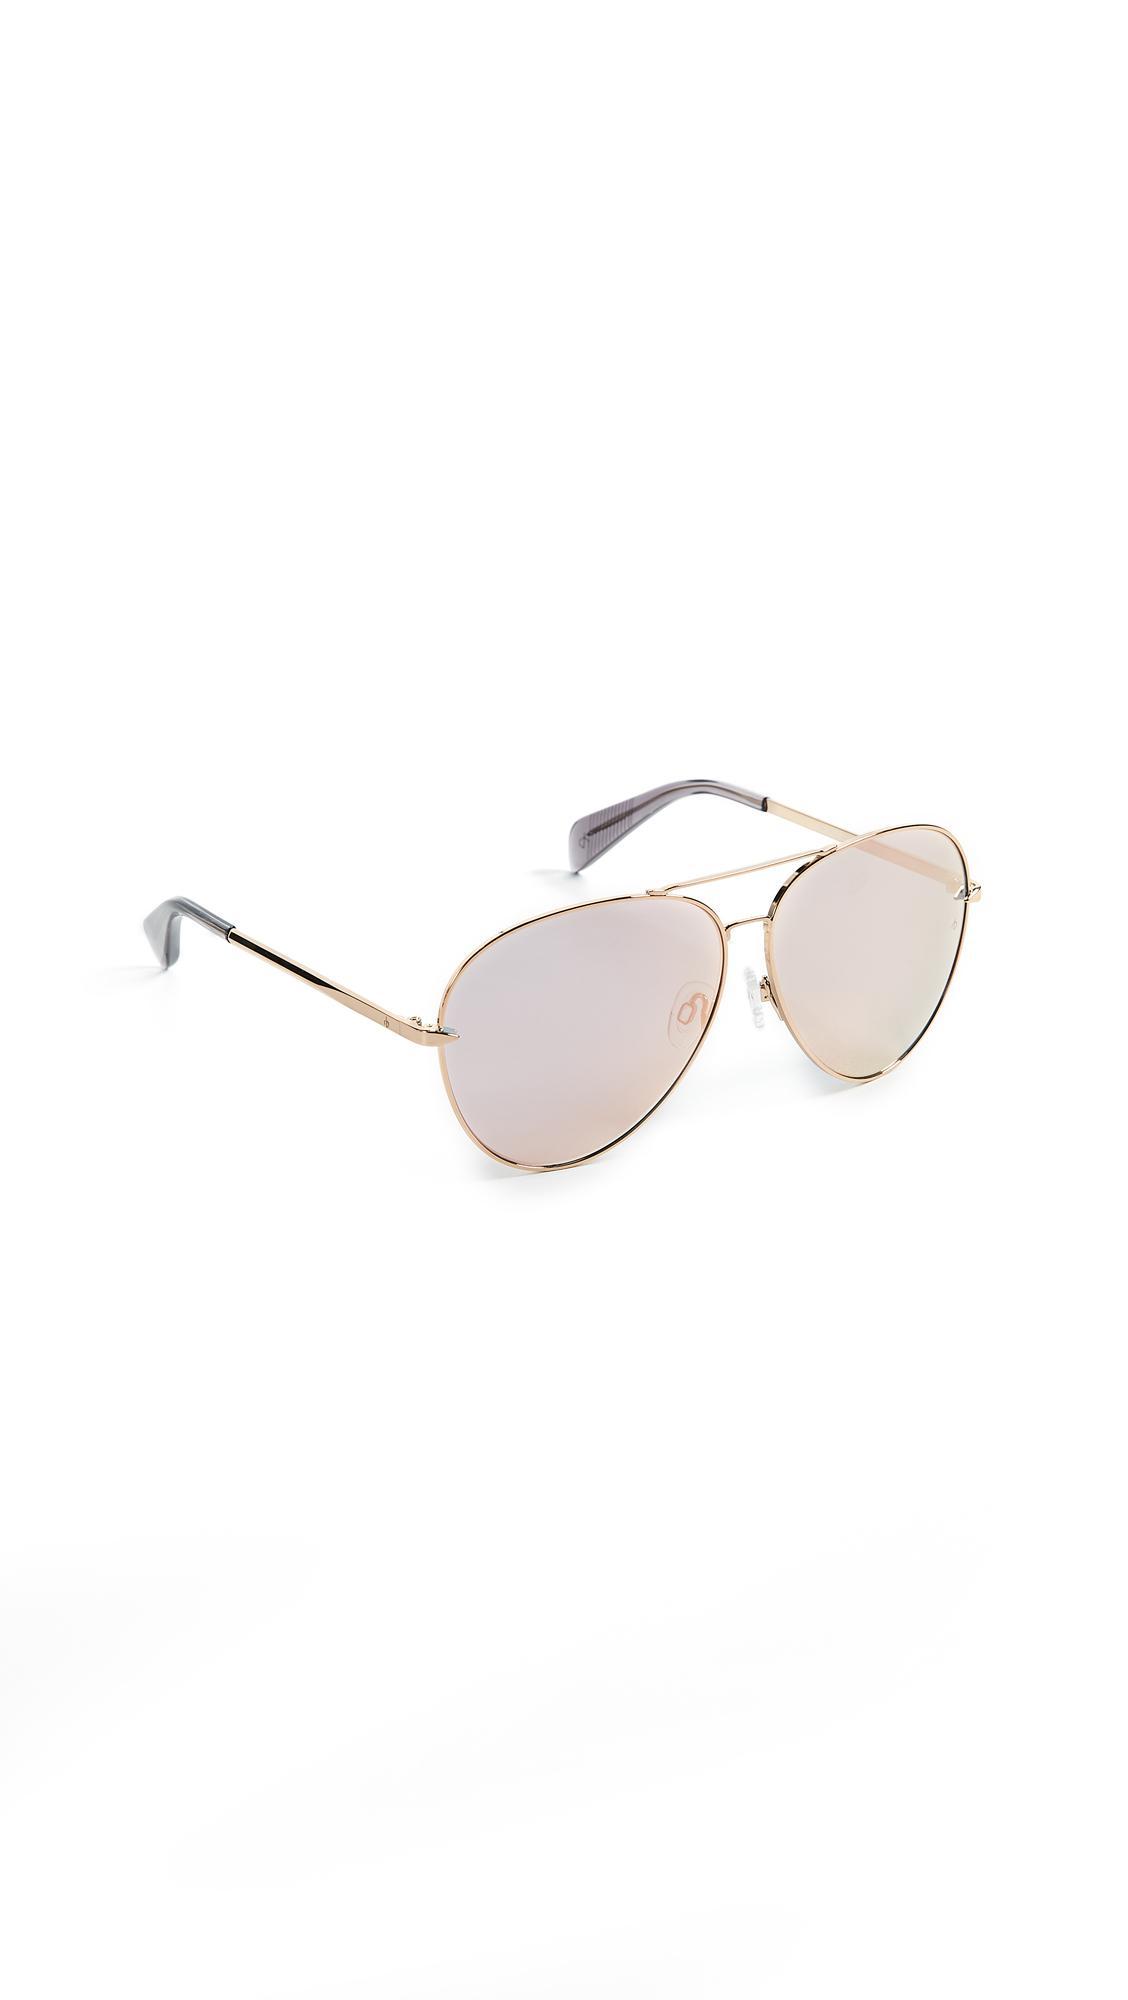 ccf22a0cf7938 Rag   Bone Runway Aviator Sunglasses In Gold Brown Flash